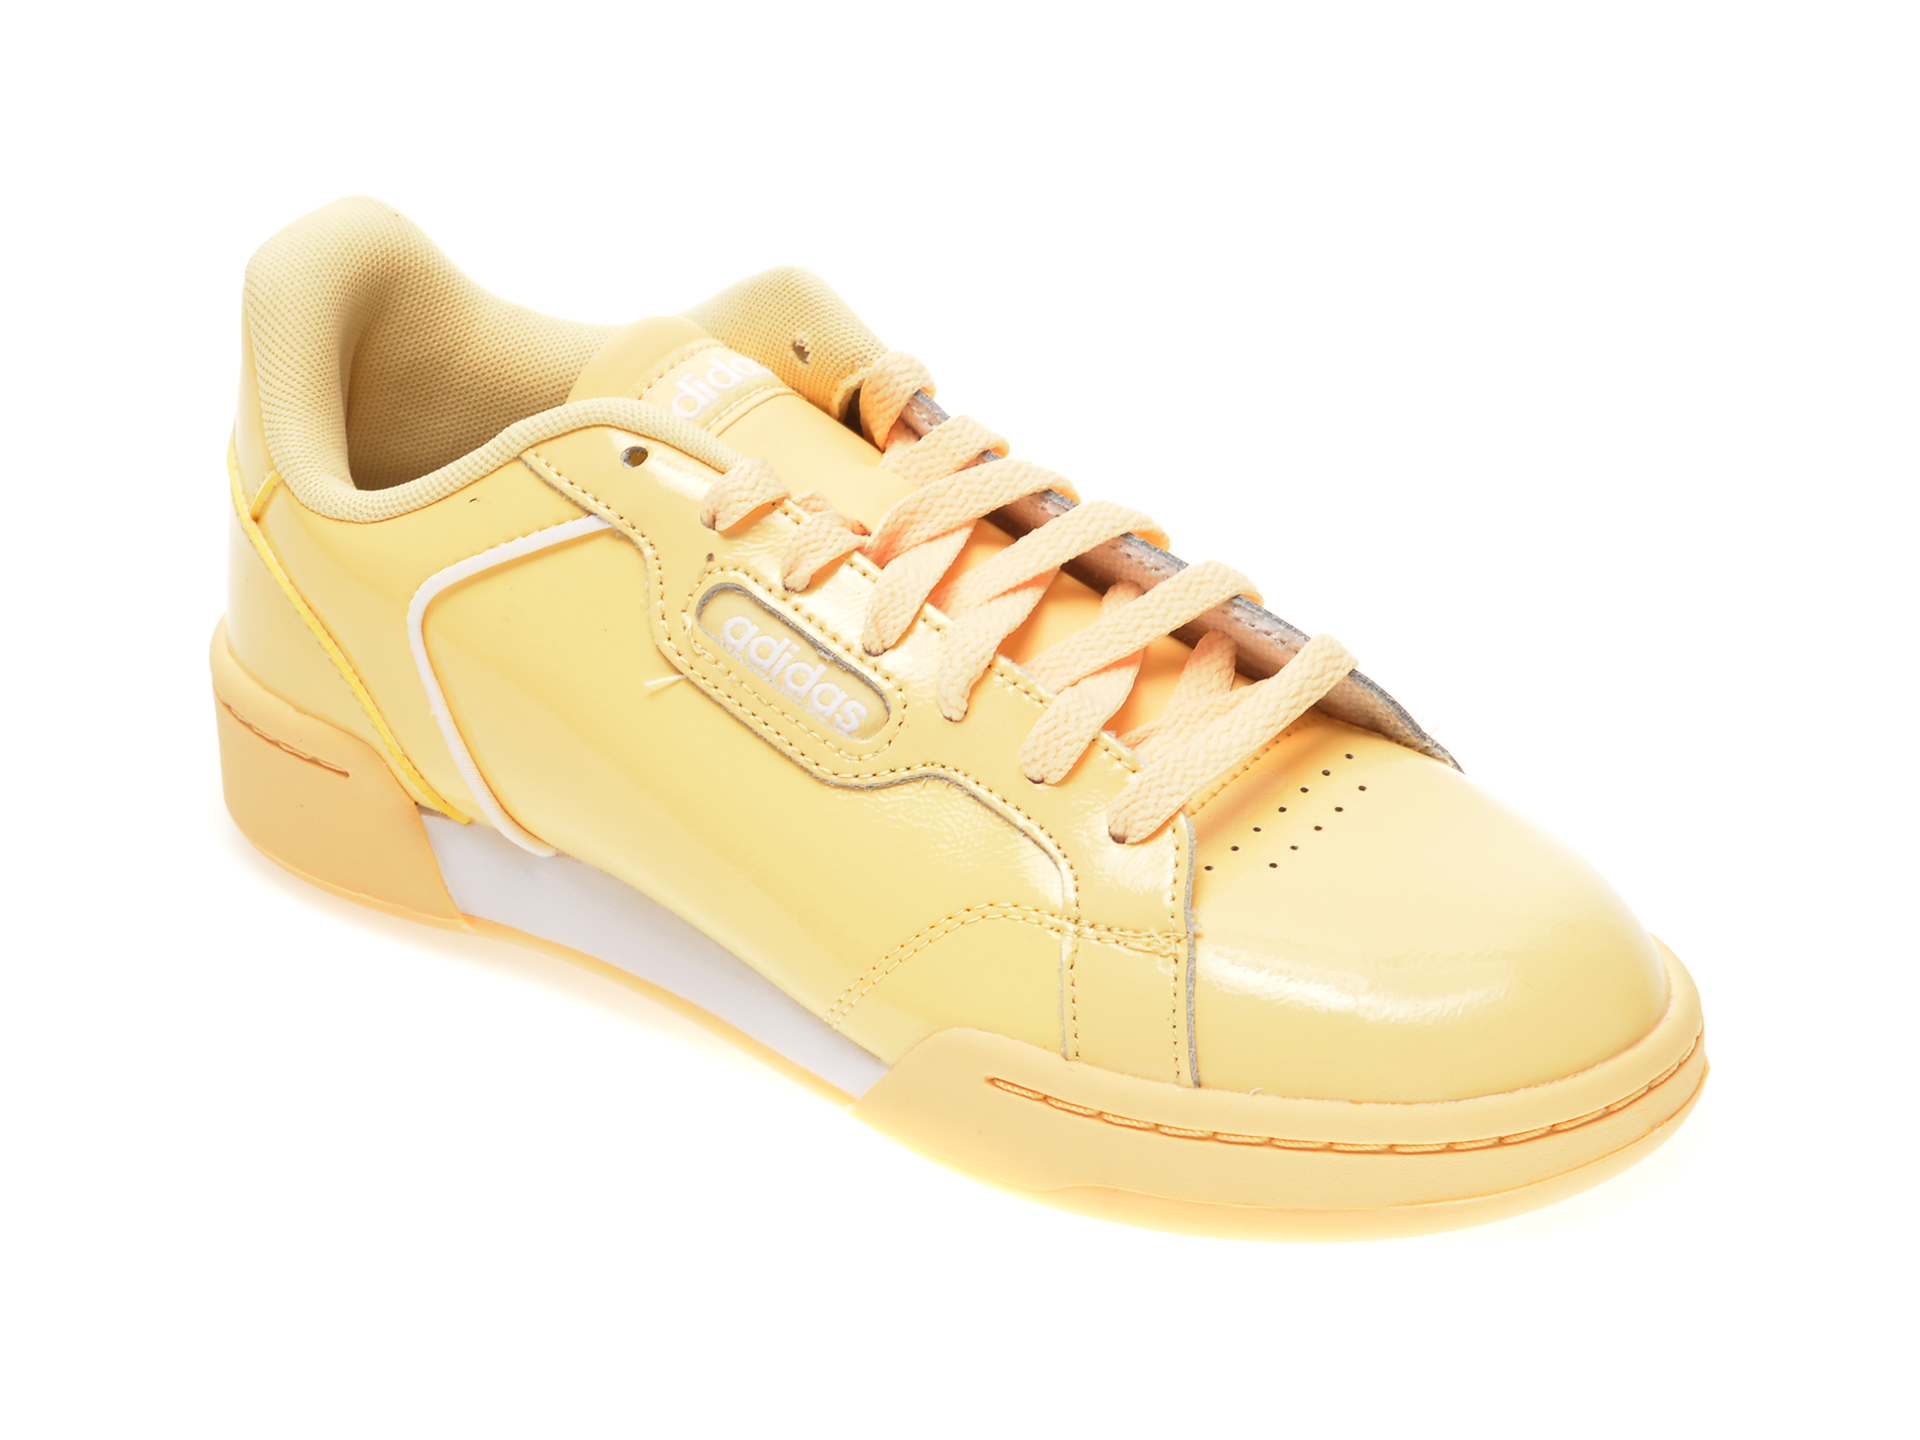 Pantofi sport ADIDAS galbeni, ROGUERA, din piele naturala